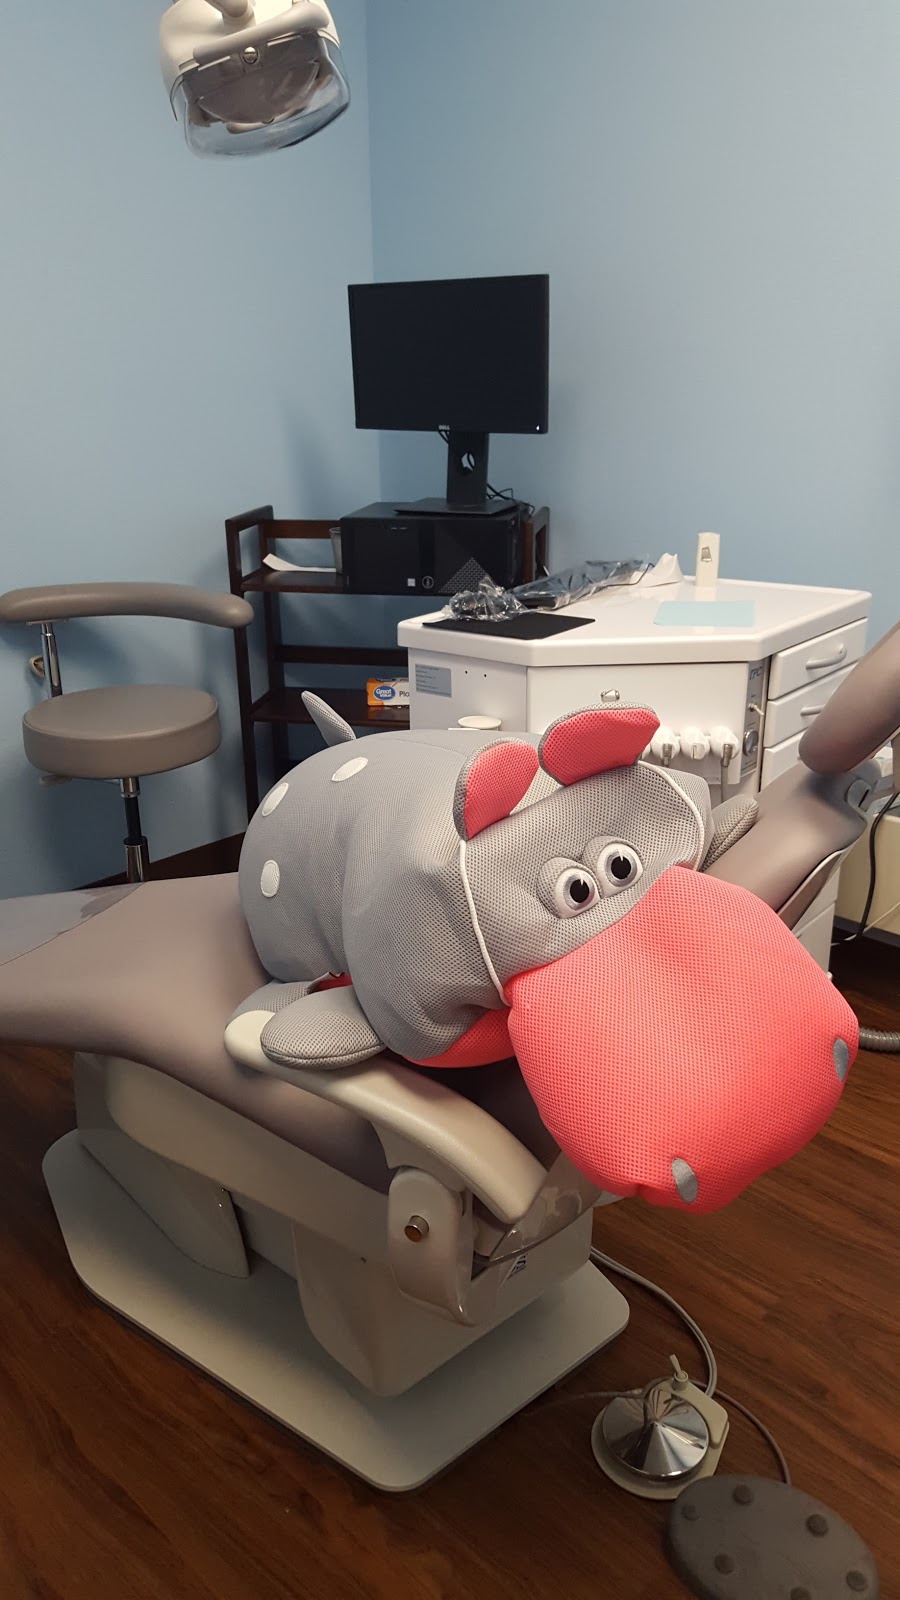 Grace Childrens Dentistry - dentist    Photo 7 of 9   Address: 6400 Holly Ave NE m, Albuquerque, NM 87113, USA   Phone: (505) 295-1942